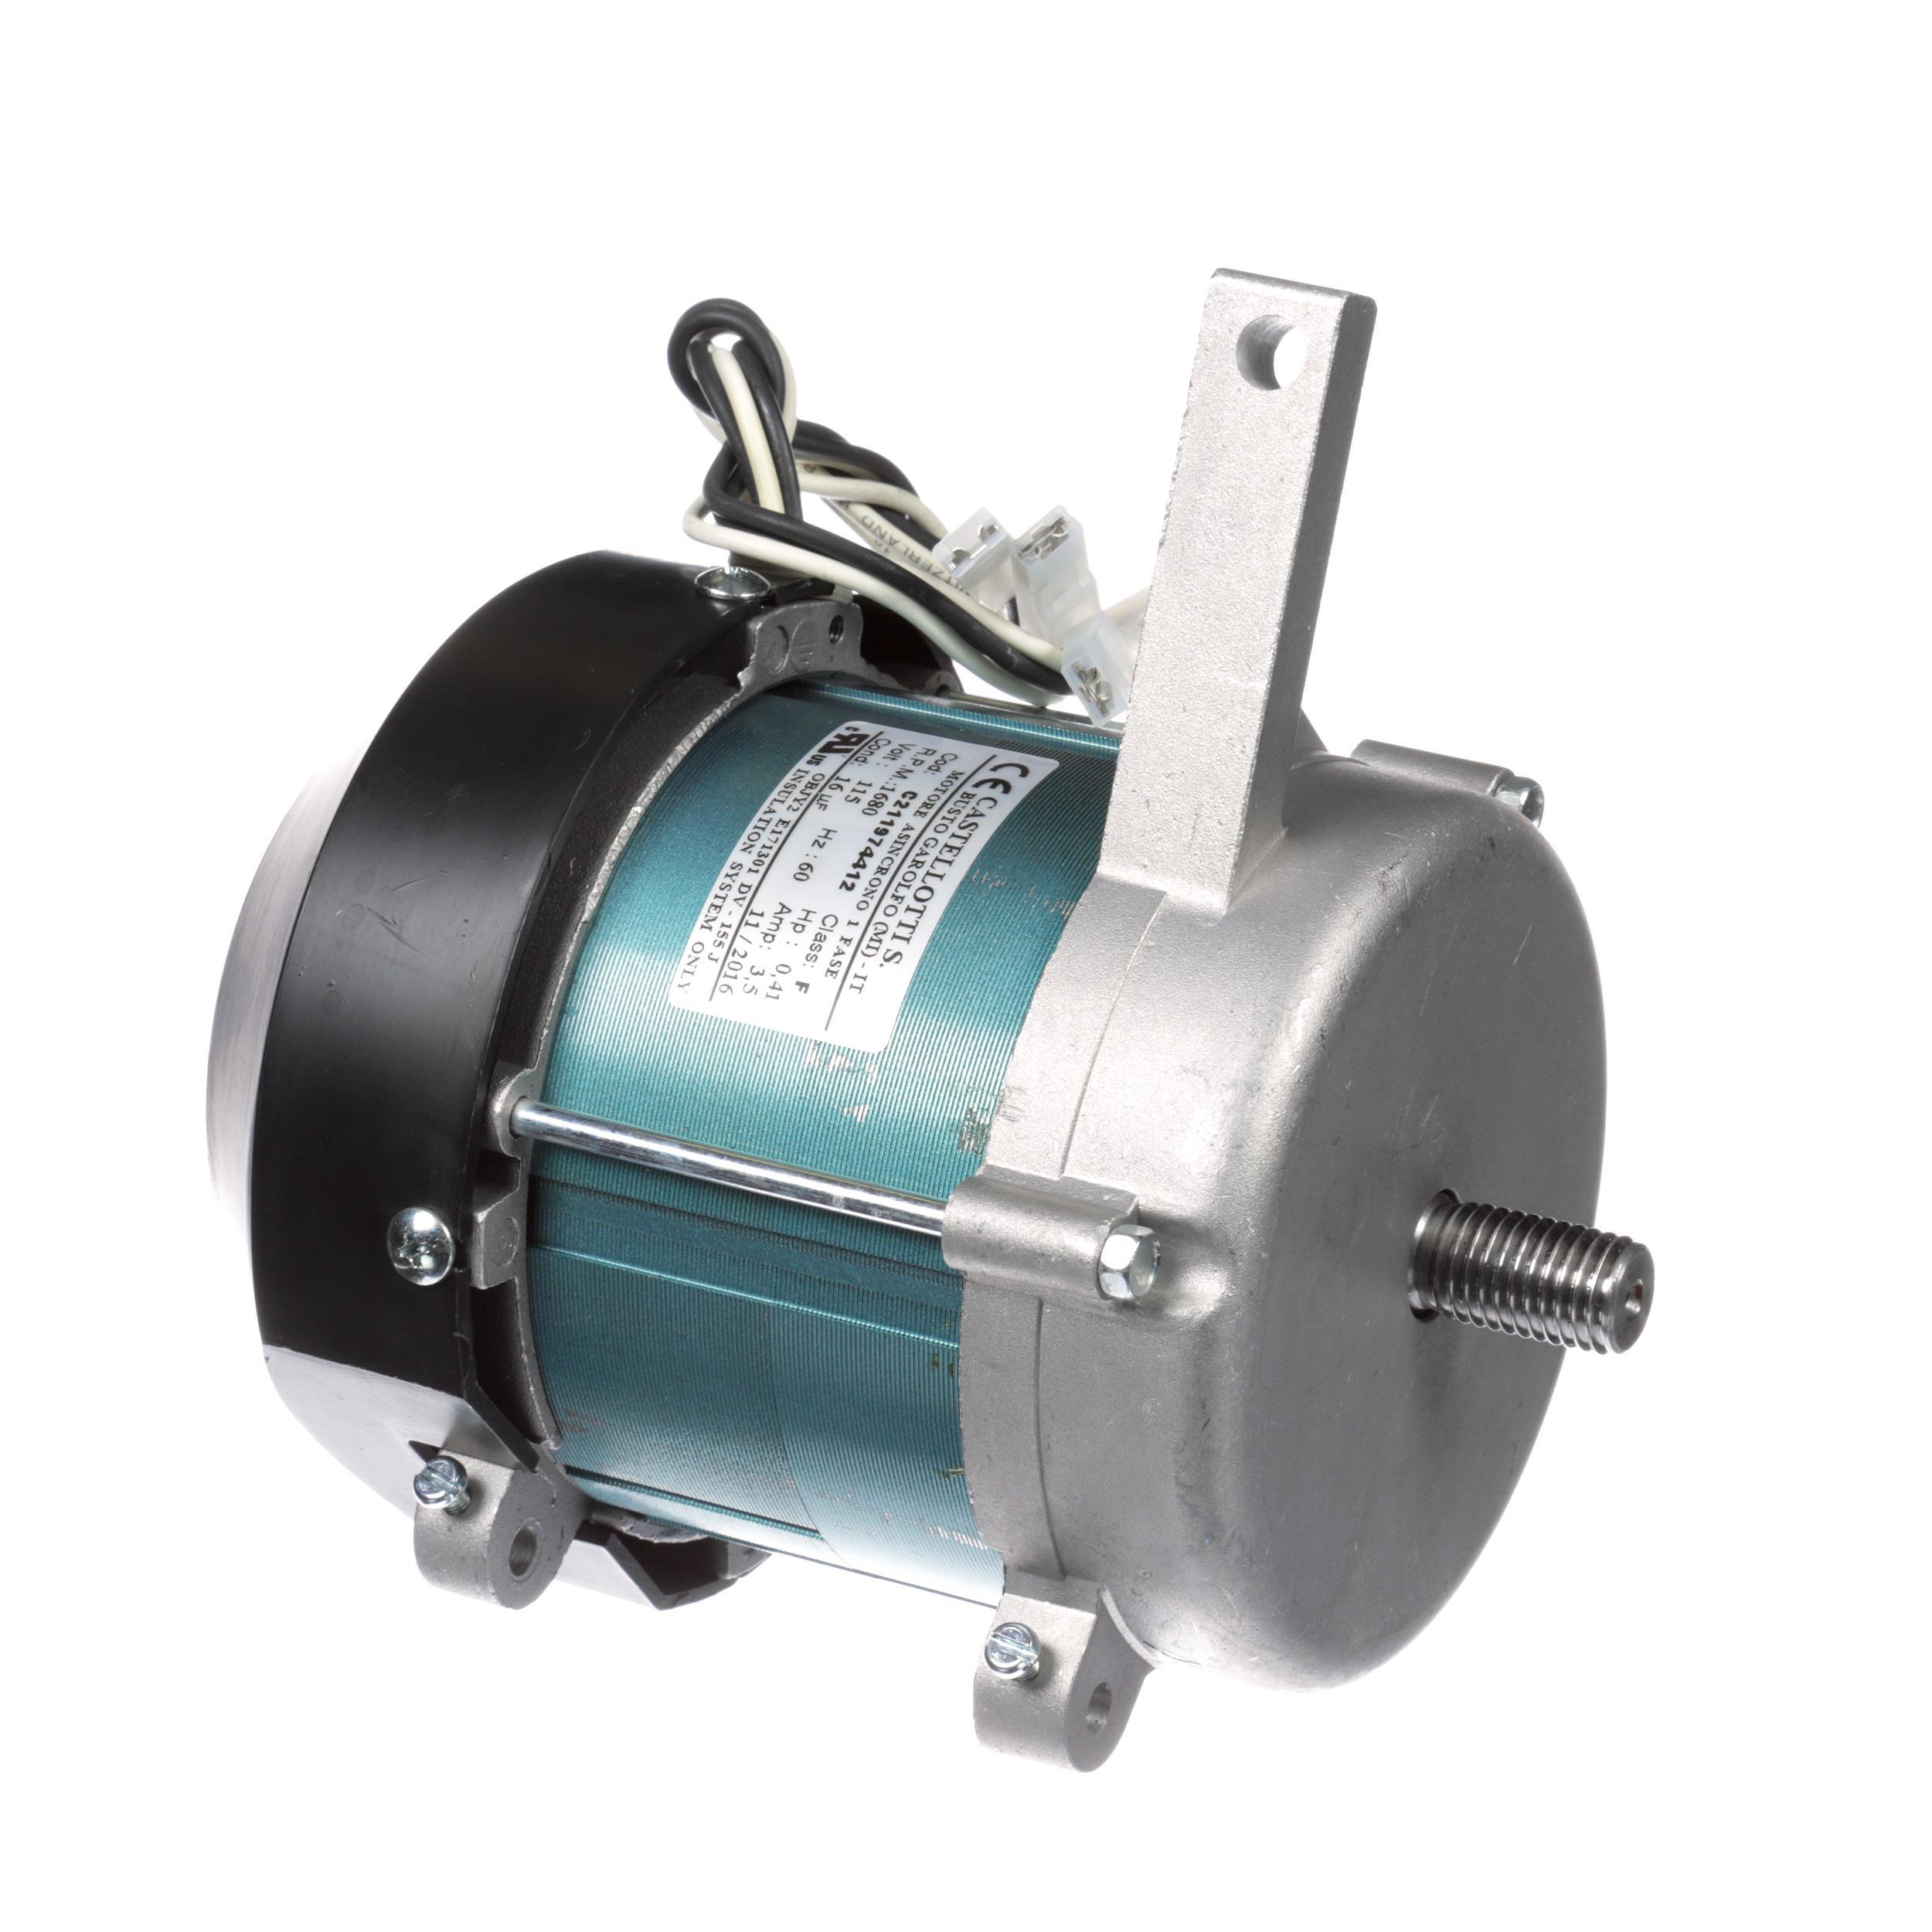 Globe 1 2 Hp Motor G12 G12a Part M030